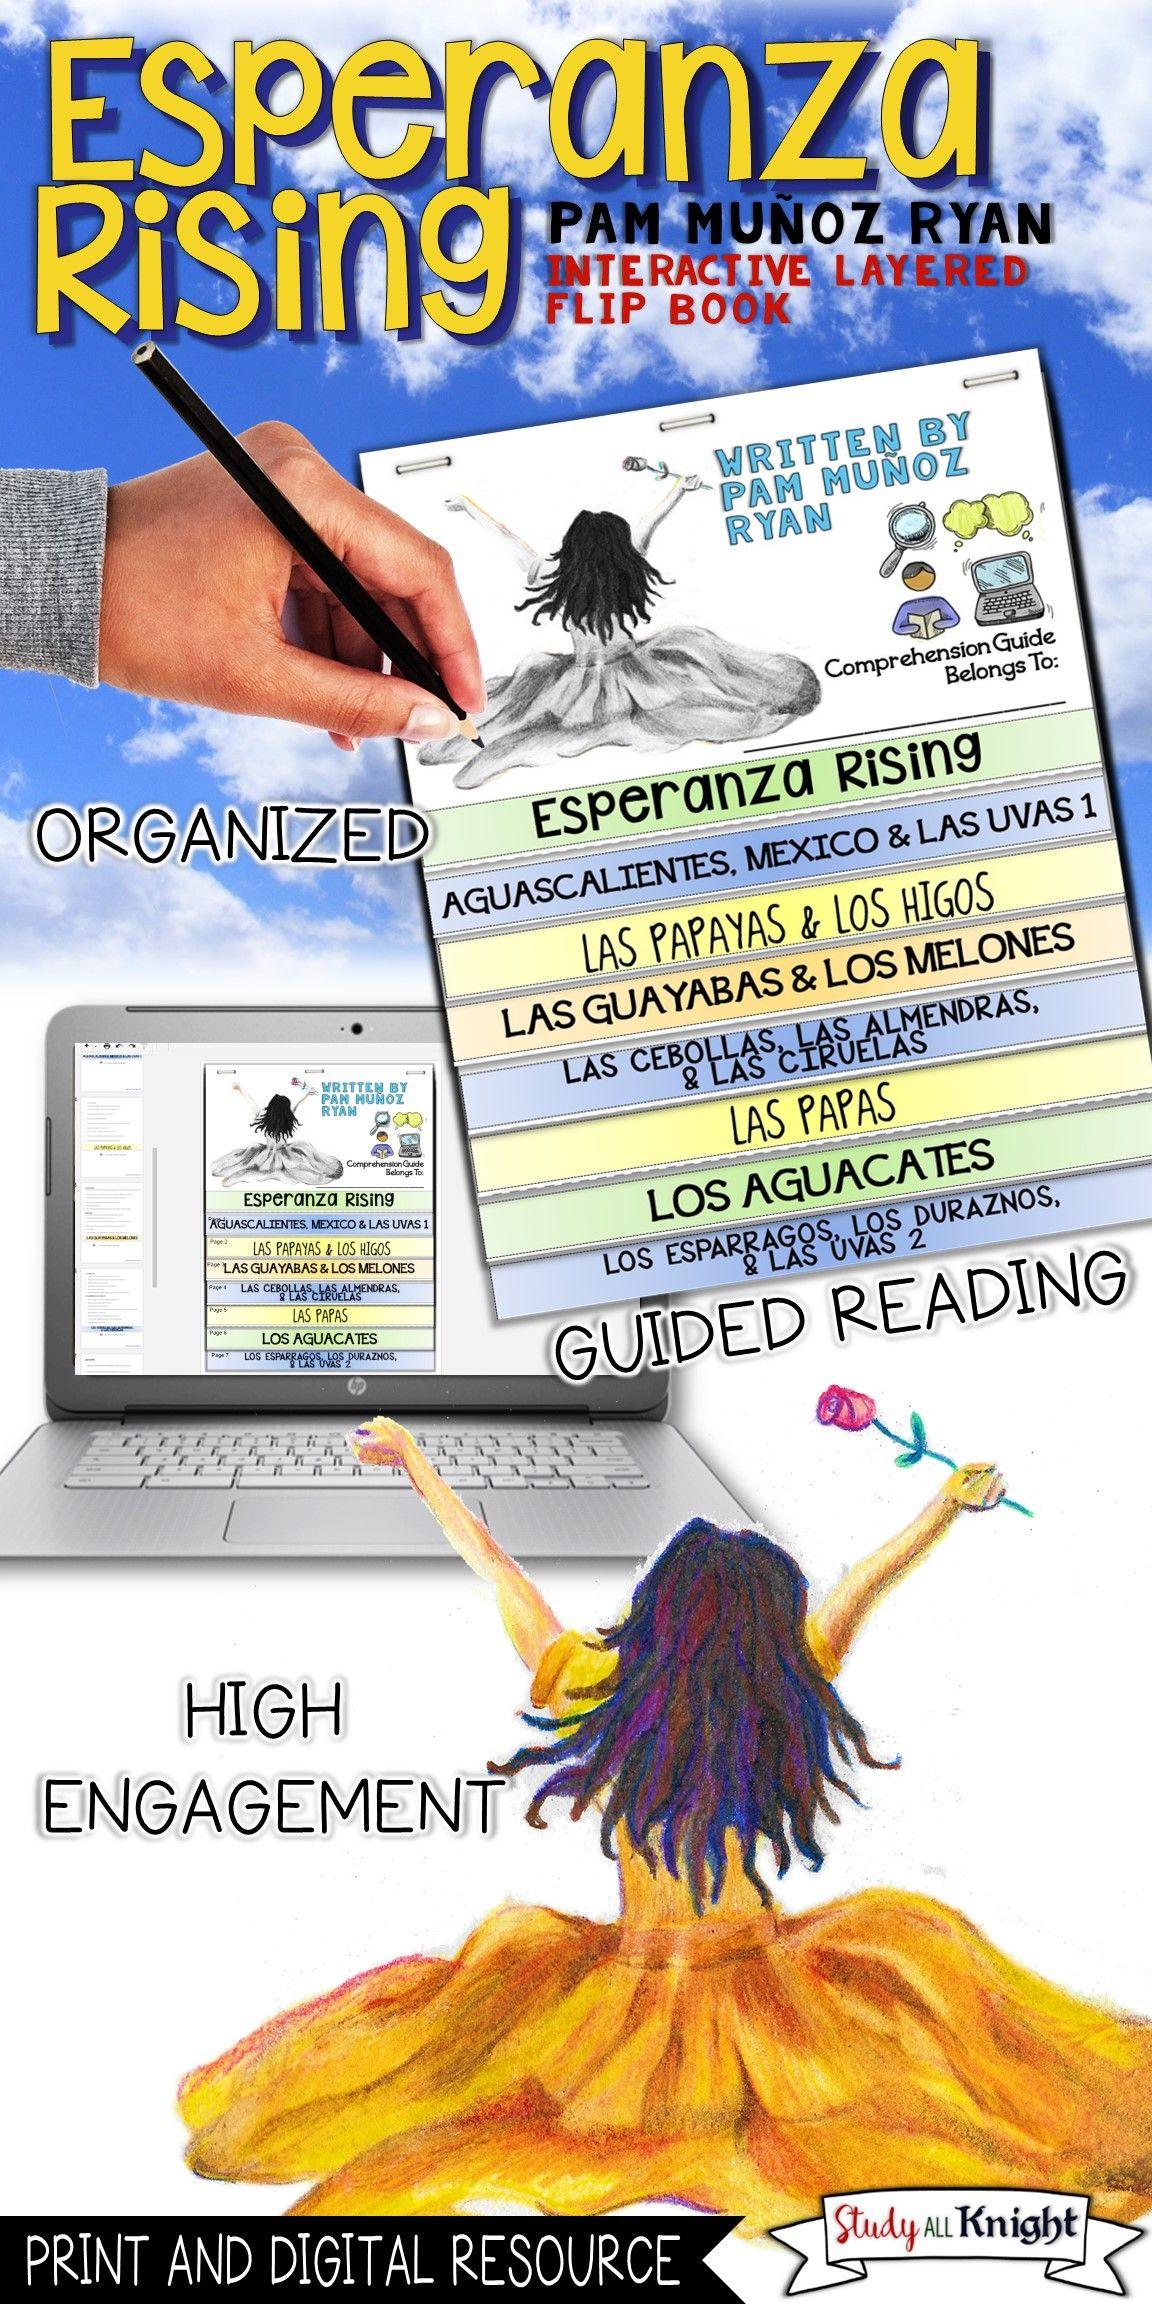 Esperanza Rising Novel Reading Guide Comprehension Questions Flip Book